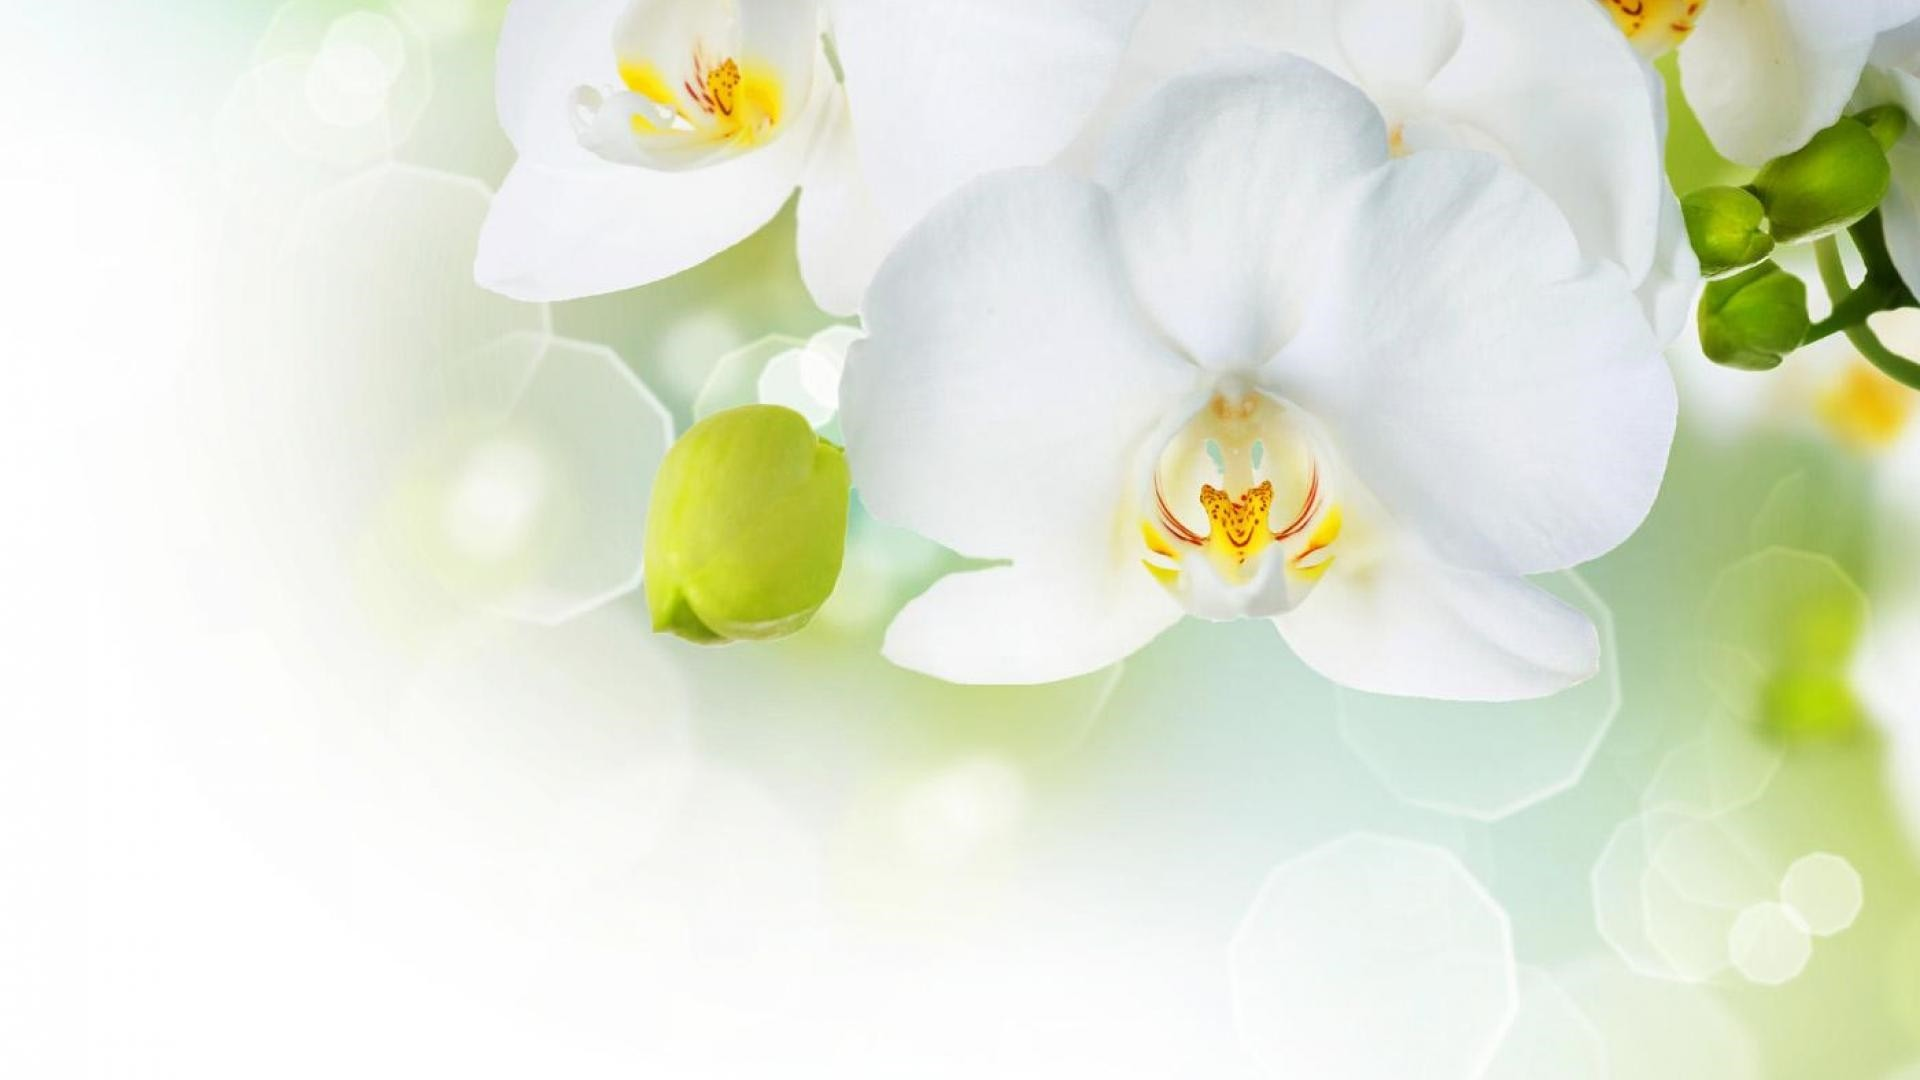 White Flower hd wallpaper download